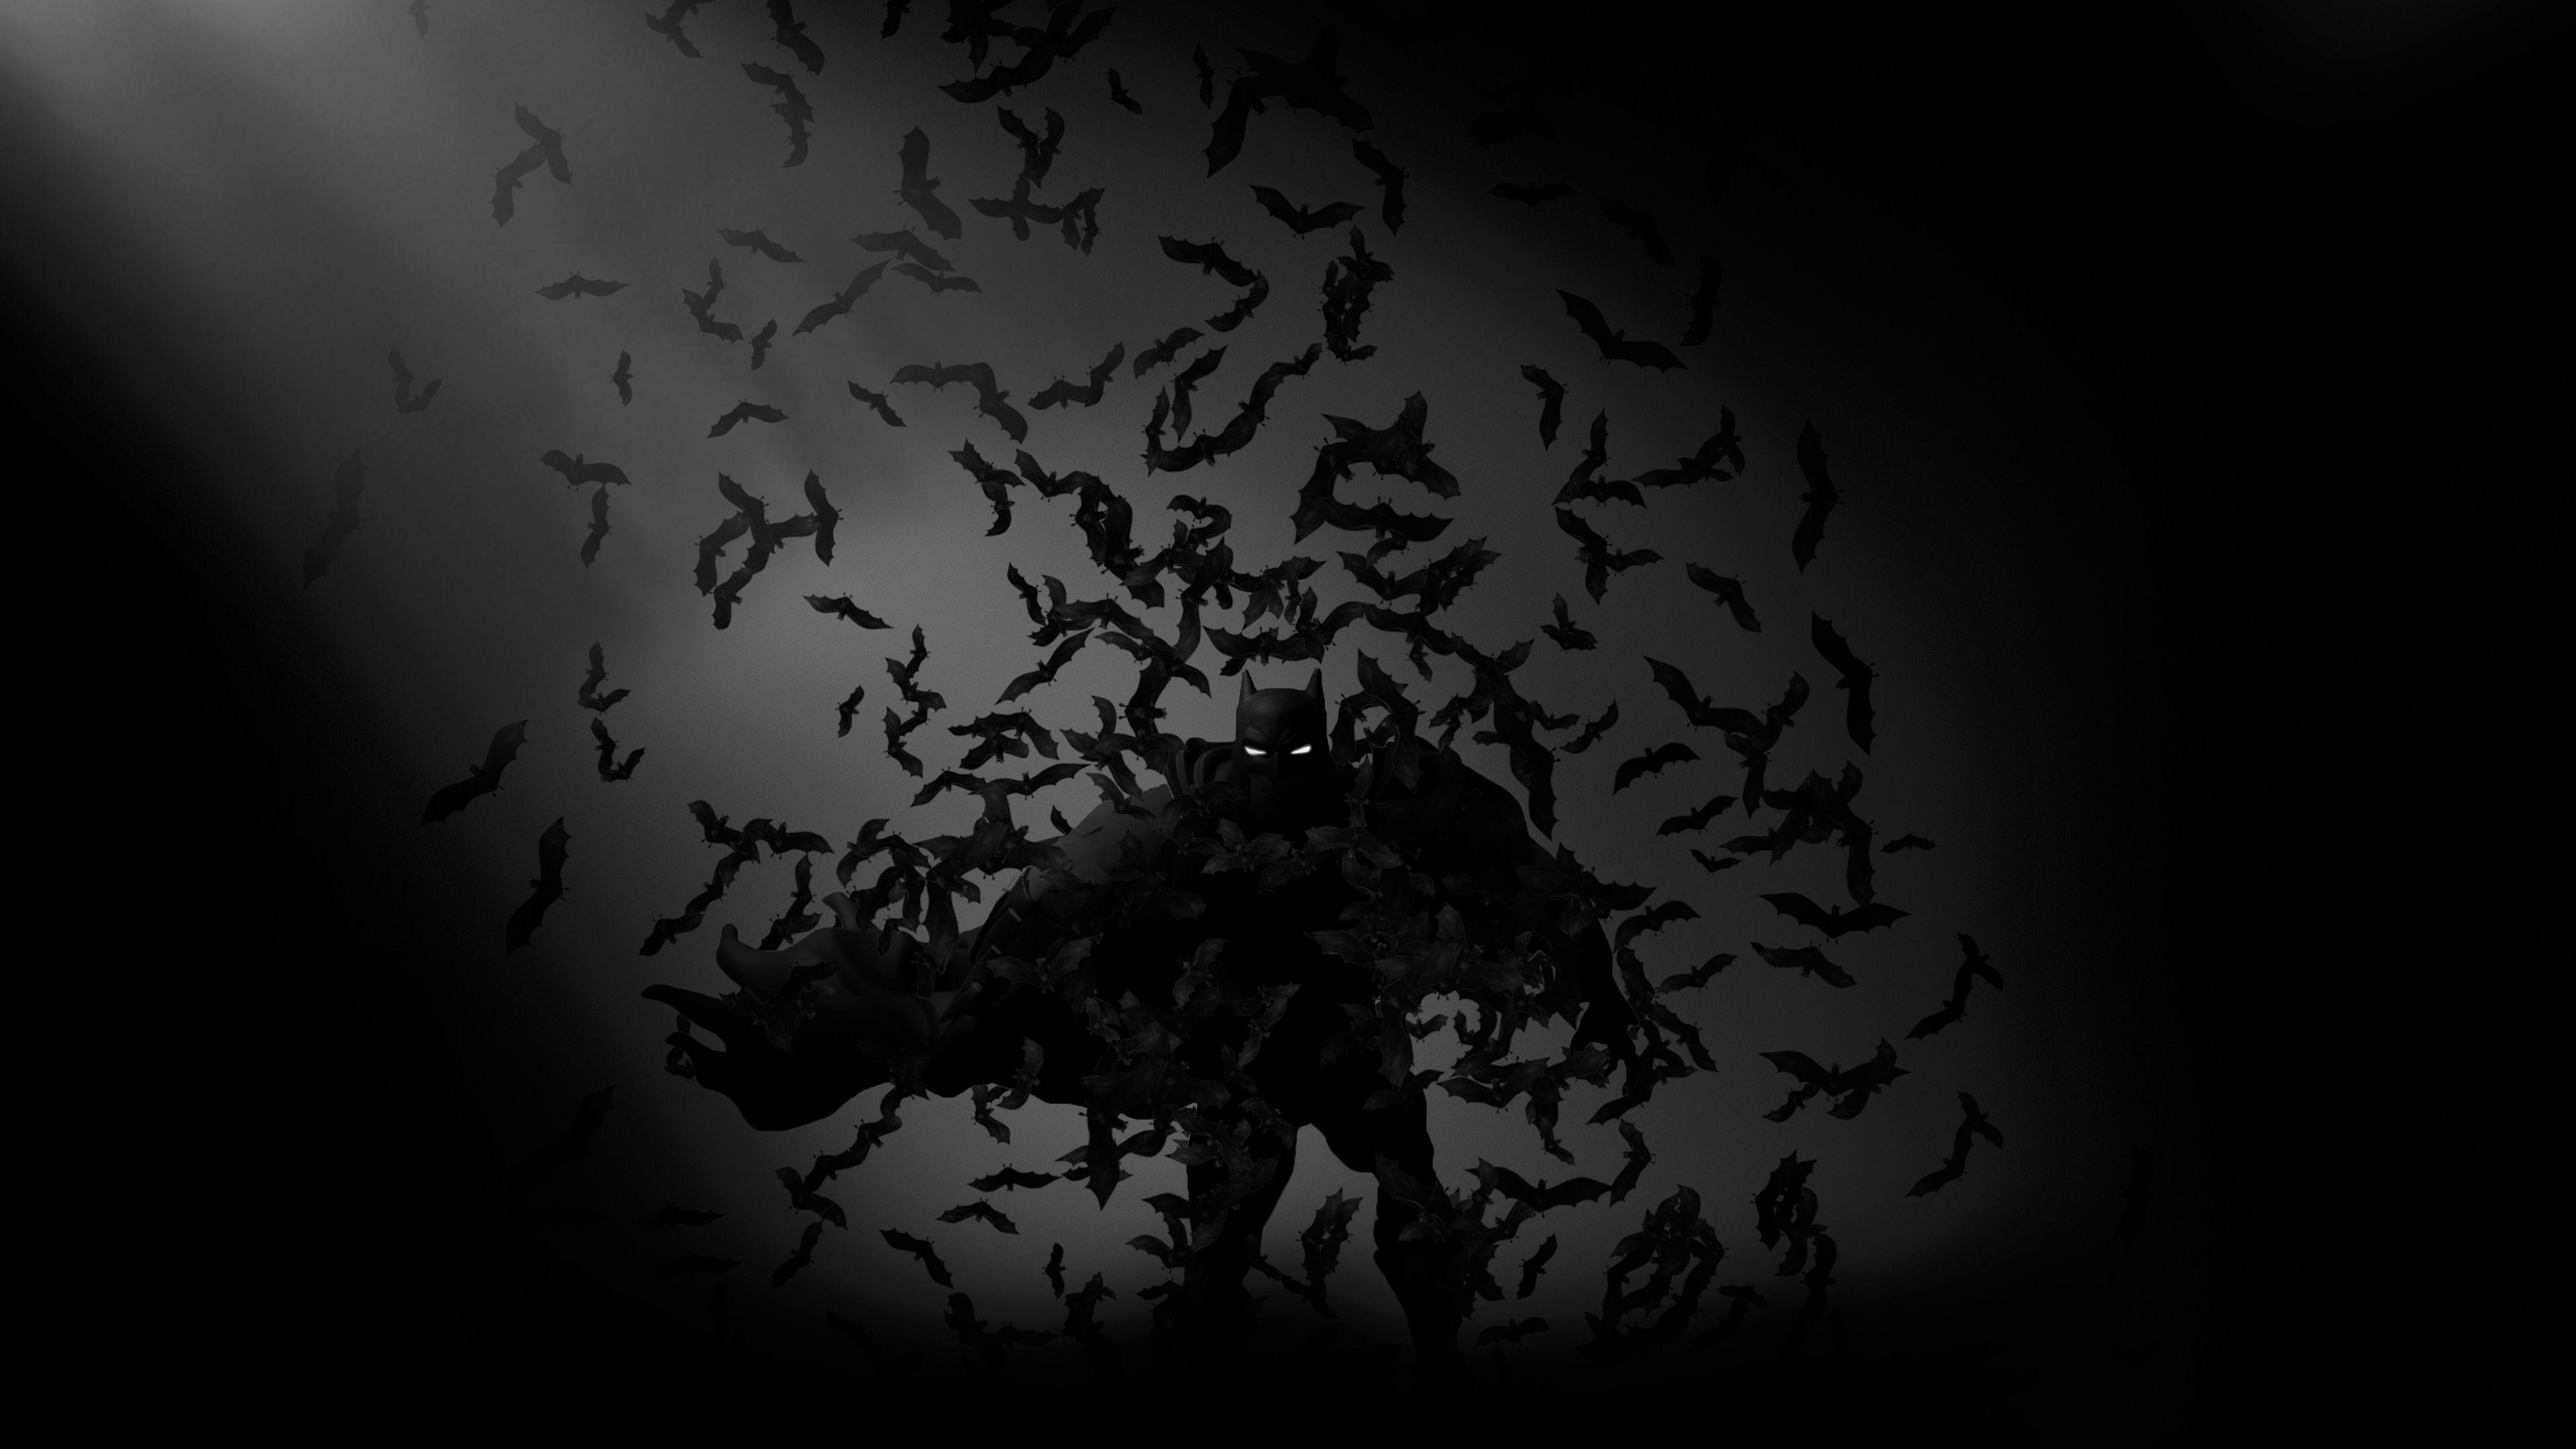 Batman Bats Art 4k Monochrome Wallpapers Hd Wallpapers Black And White Wallpapers Bats Wallpapers Ba Art Wallpaper Black Love Art Black And White Wallpaper